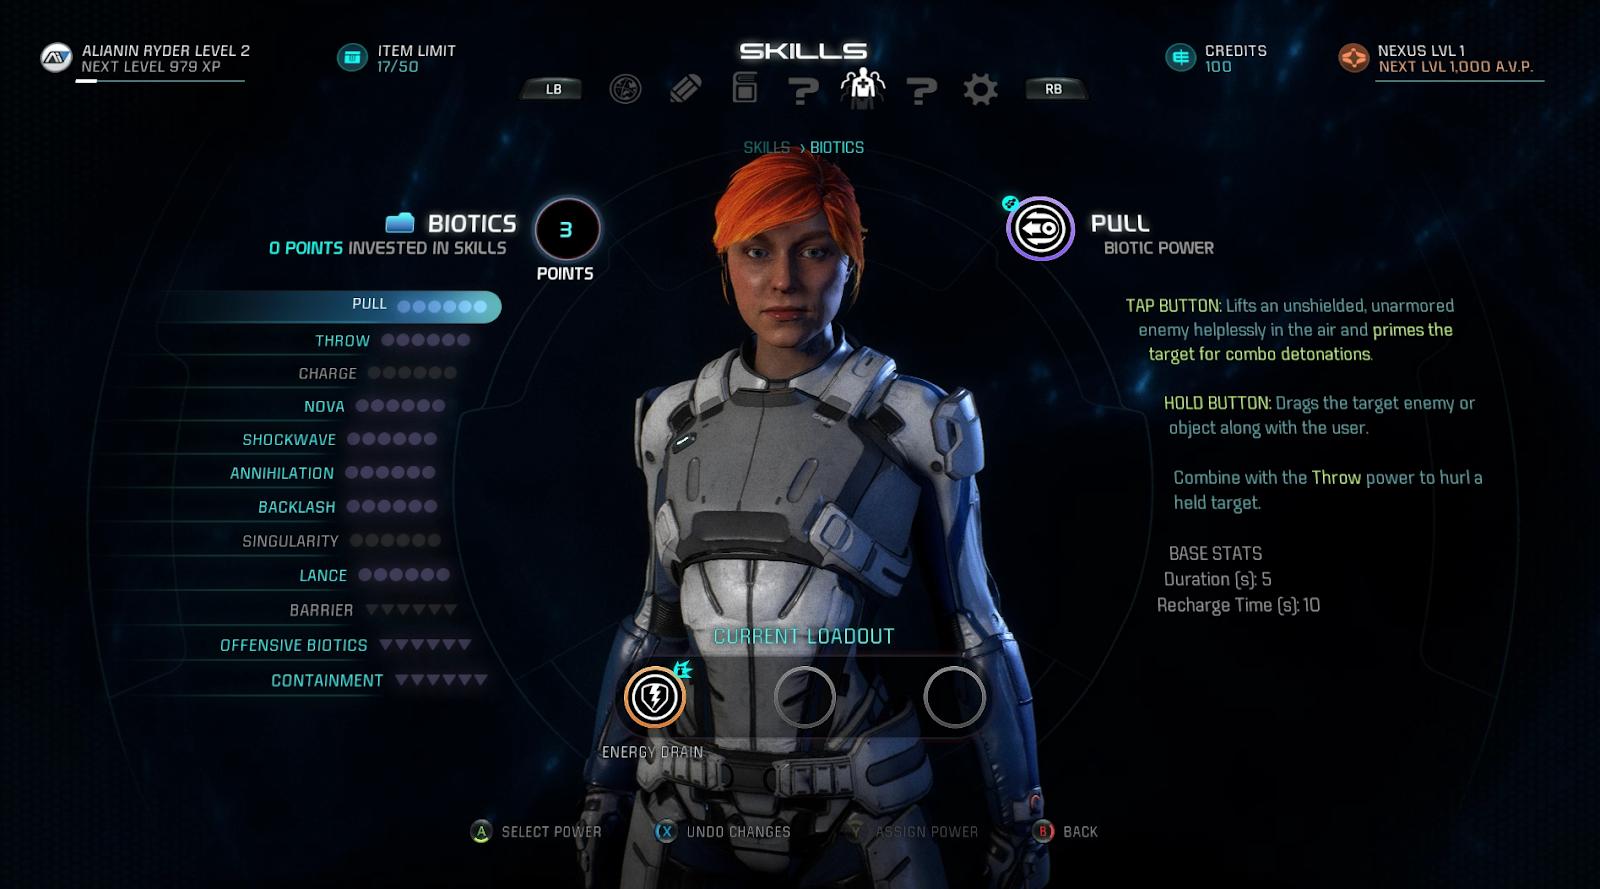 Mass Effect: Andromeda - Biotics Skills